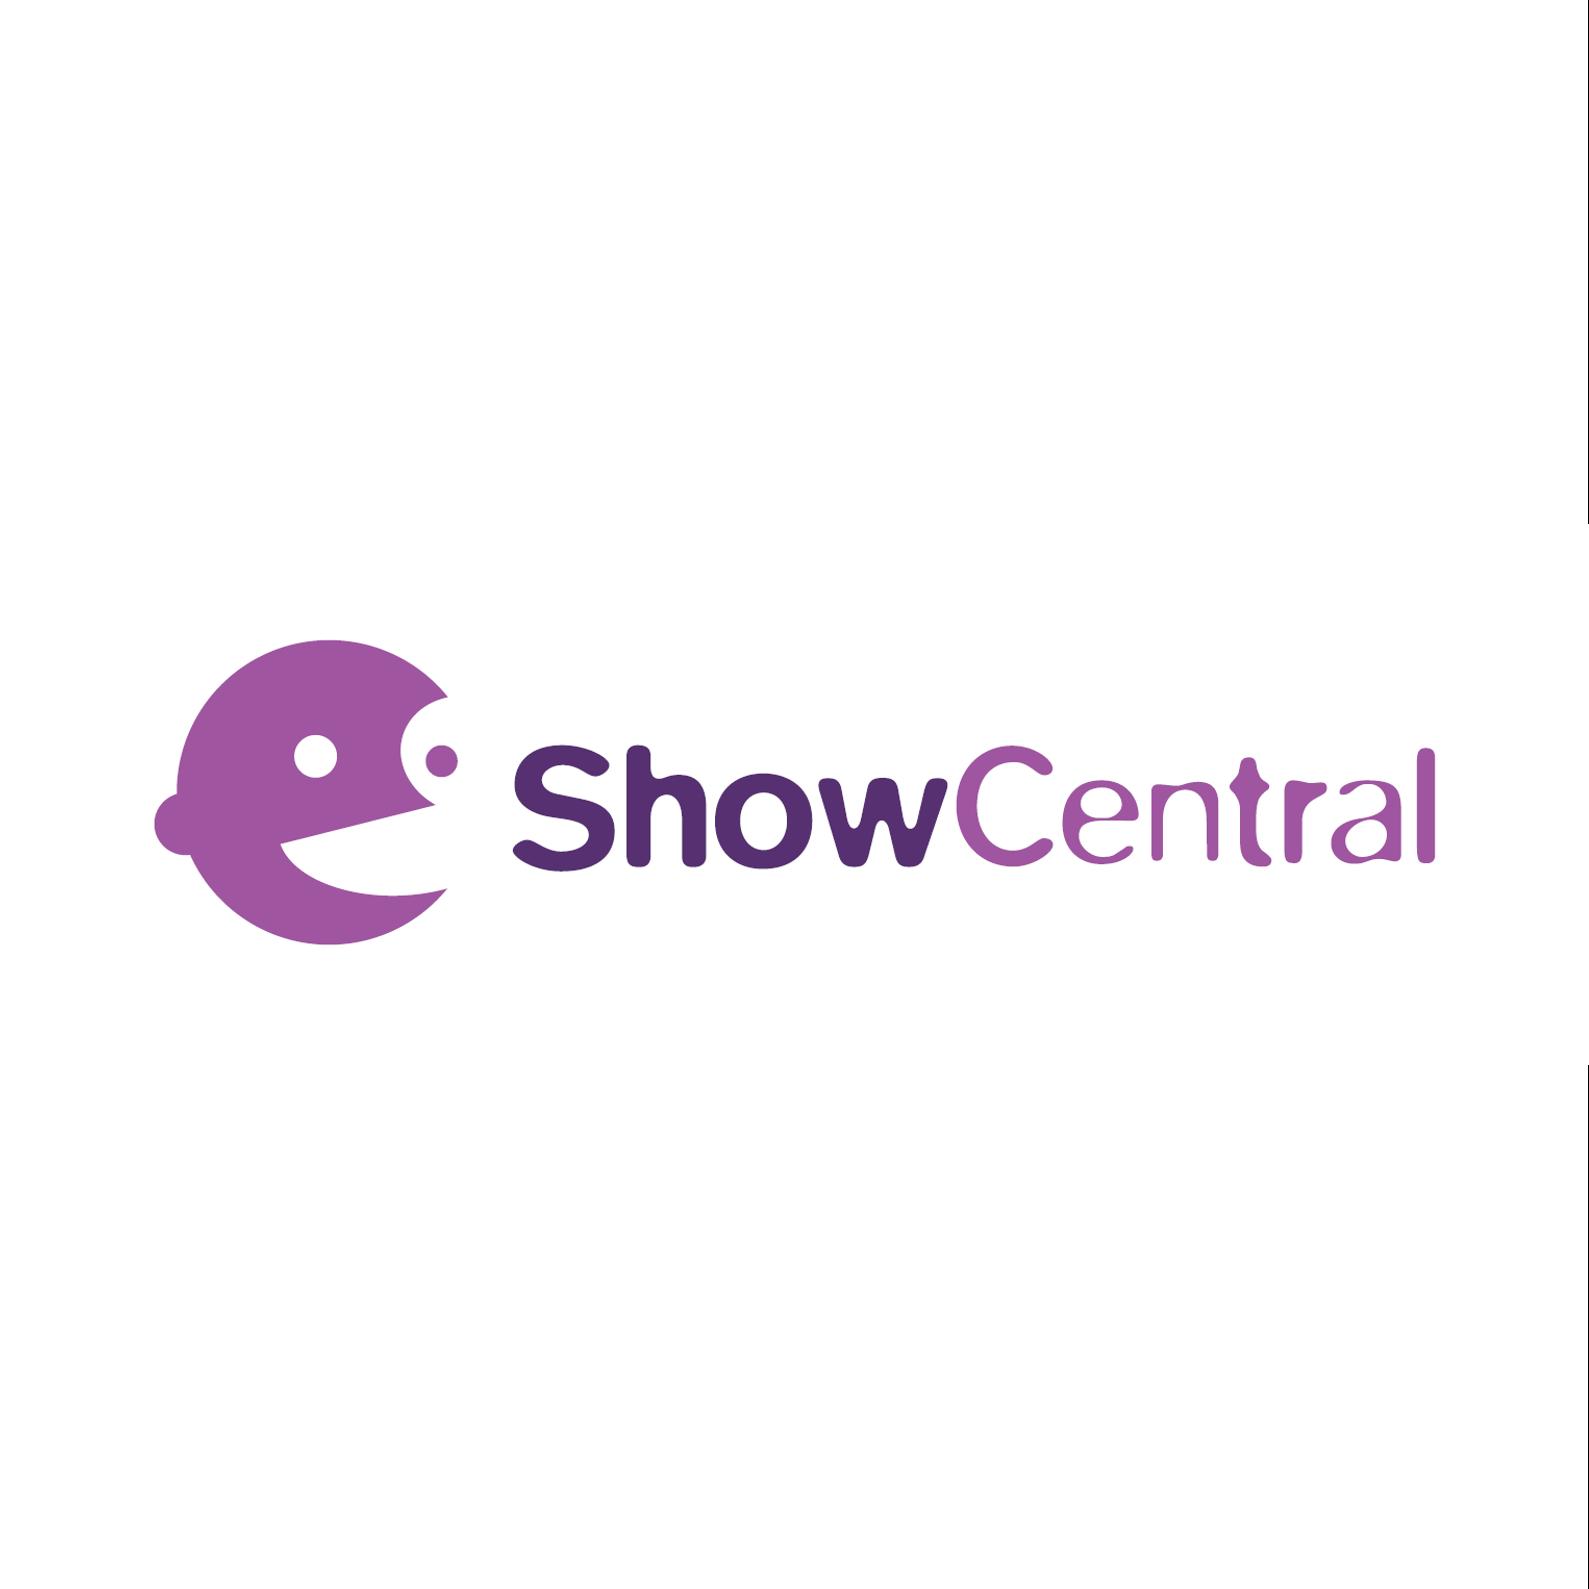 showcentral